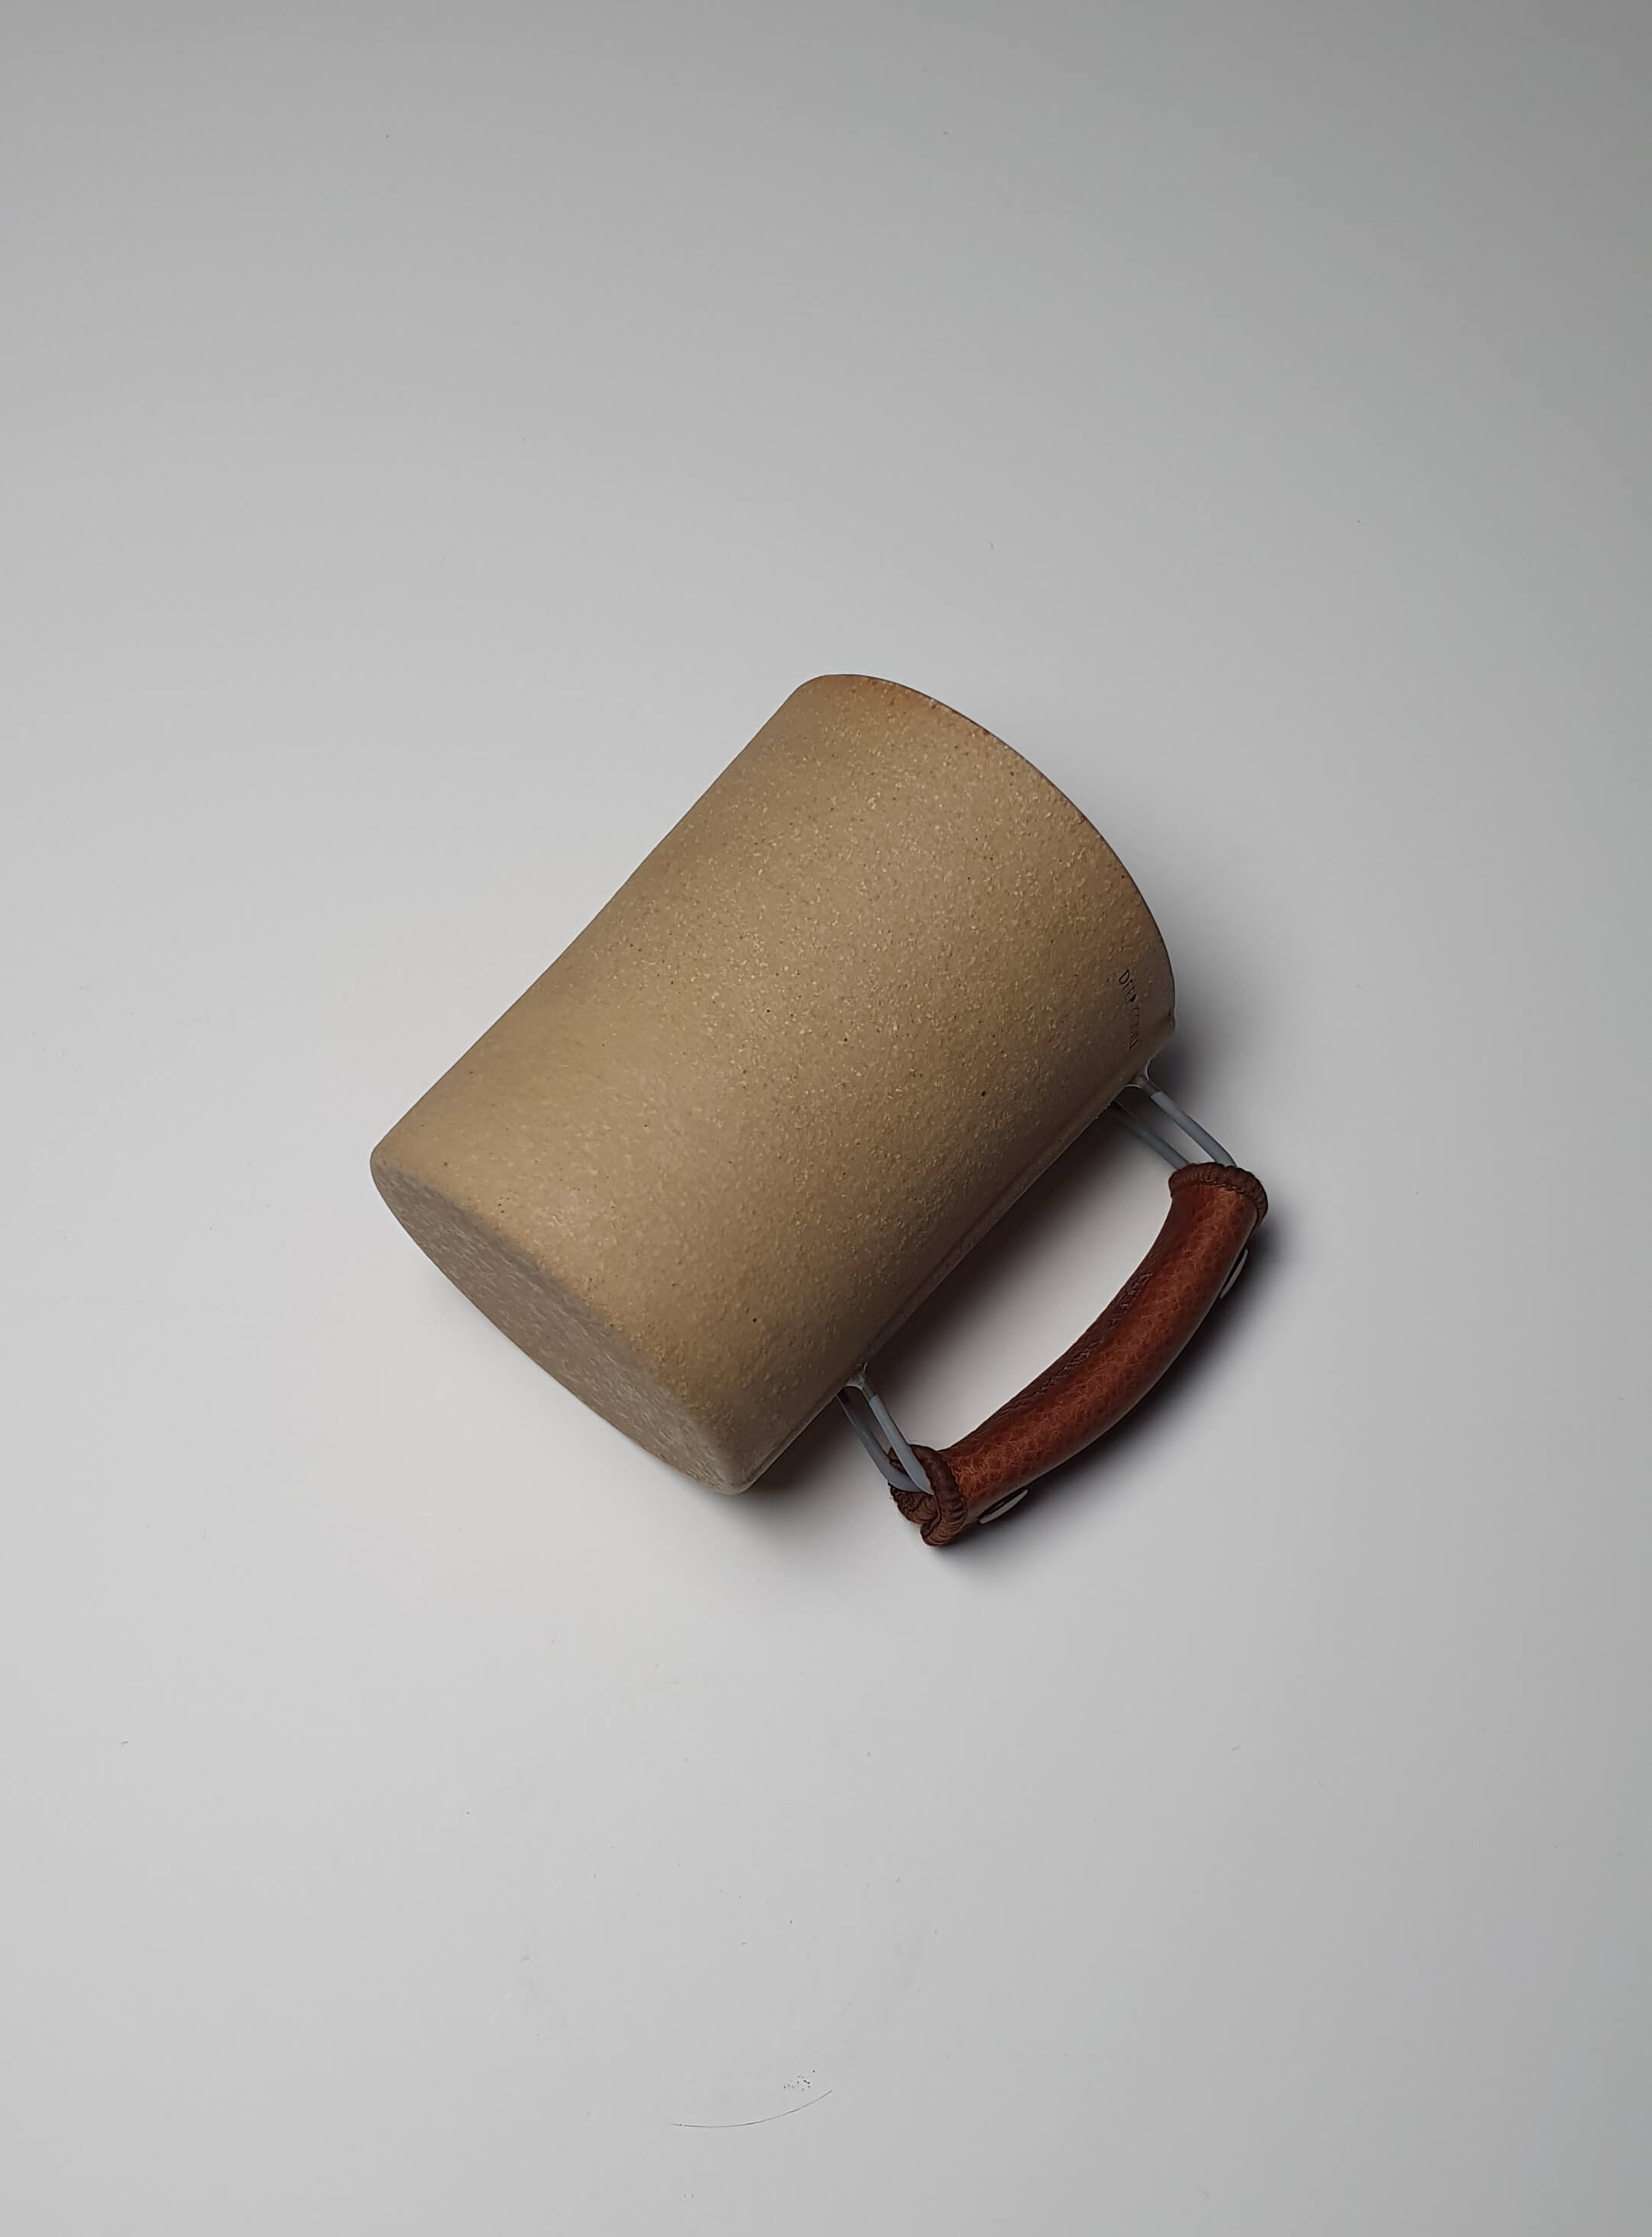 Vintage Handmade Mug in Light Brown